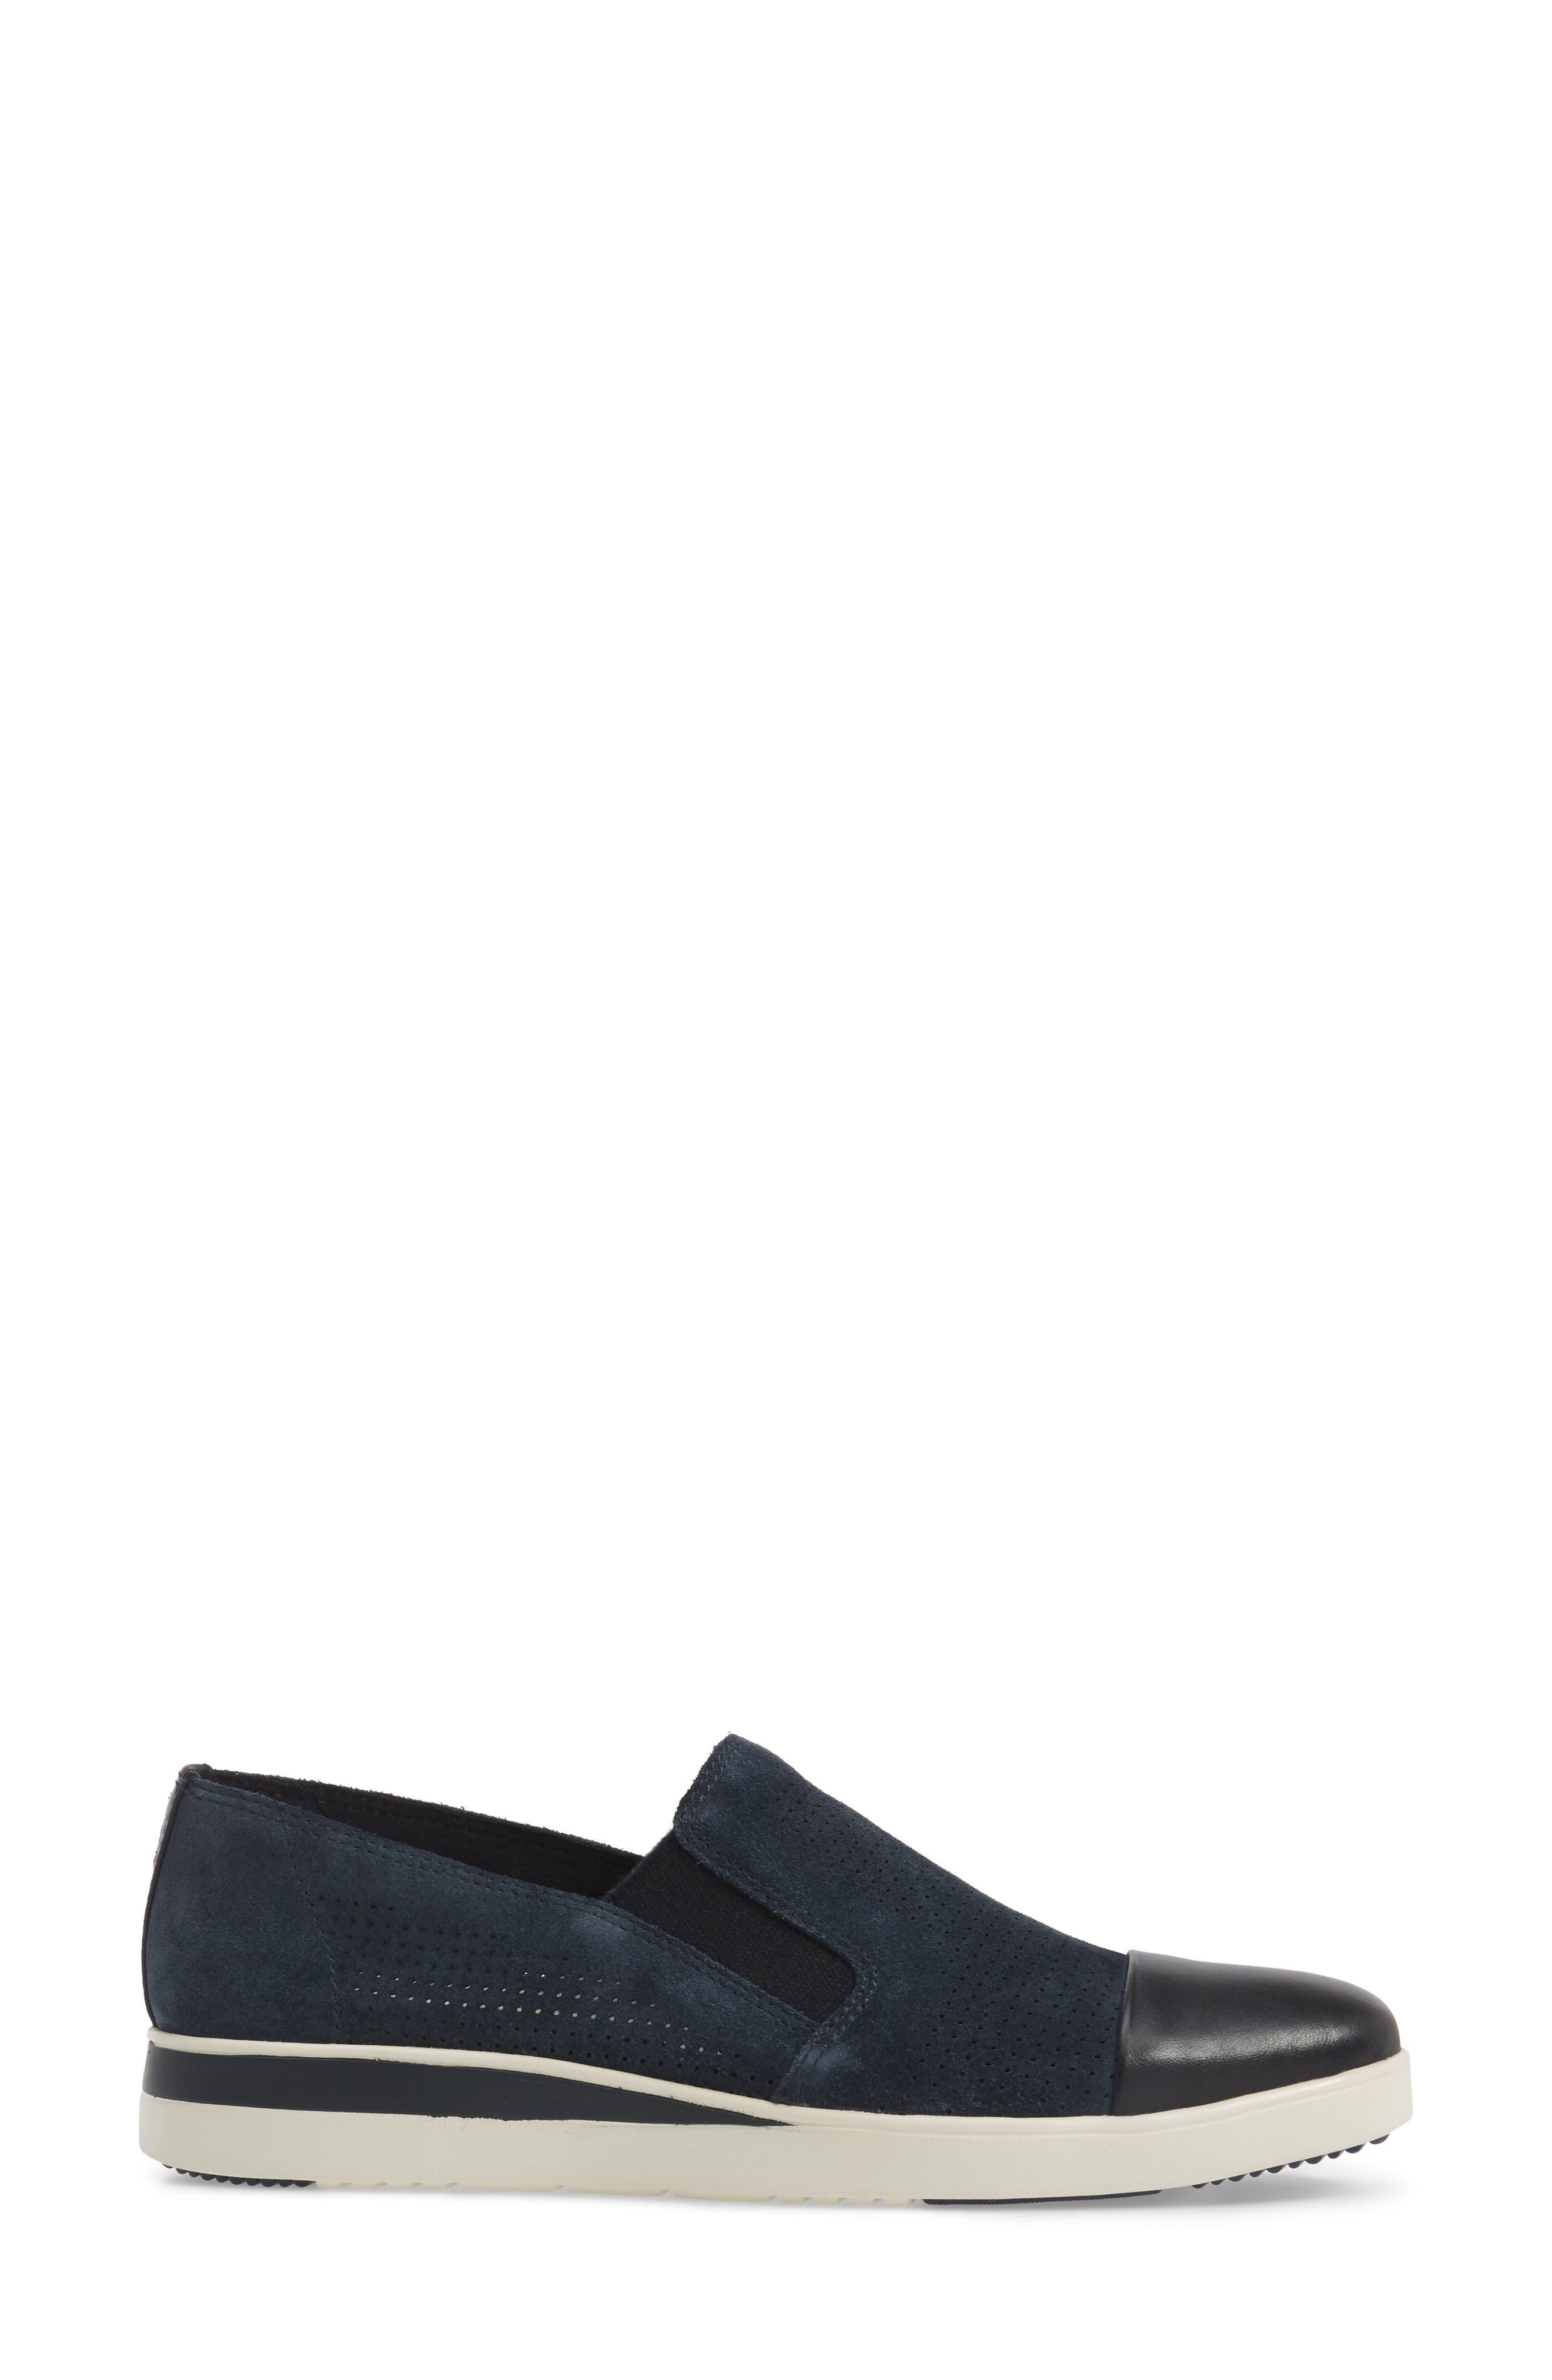 Aviana Cap Toe Slip-On Sneaker,                             Alternate thumbnail 3, color,                             Lagoon Suede